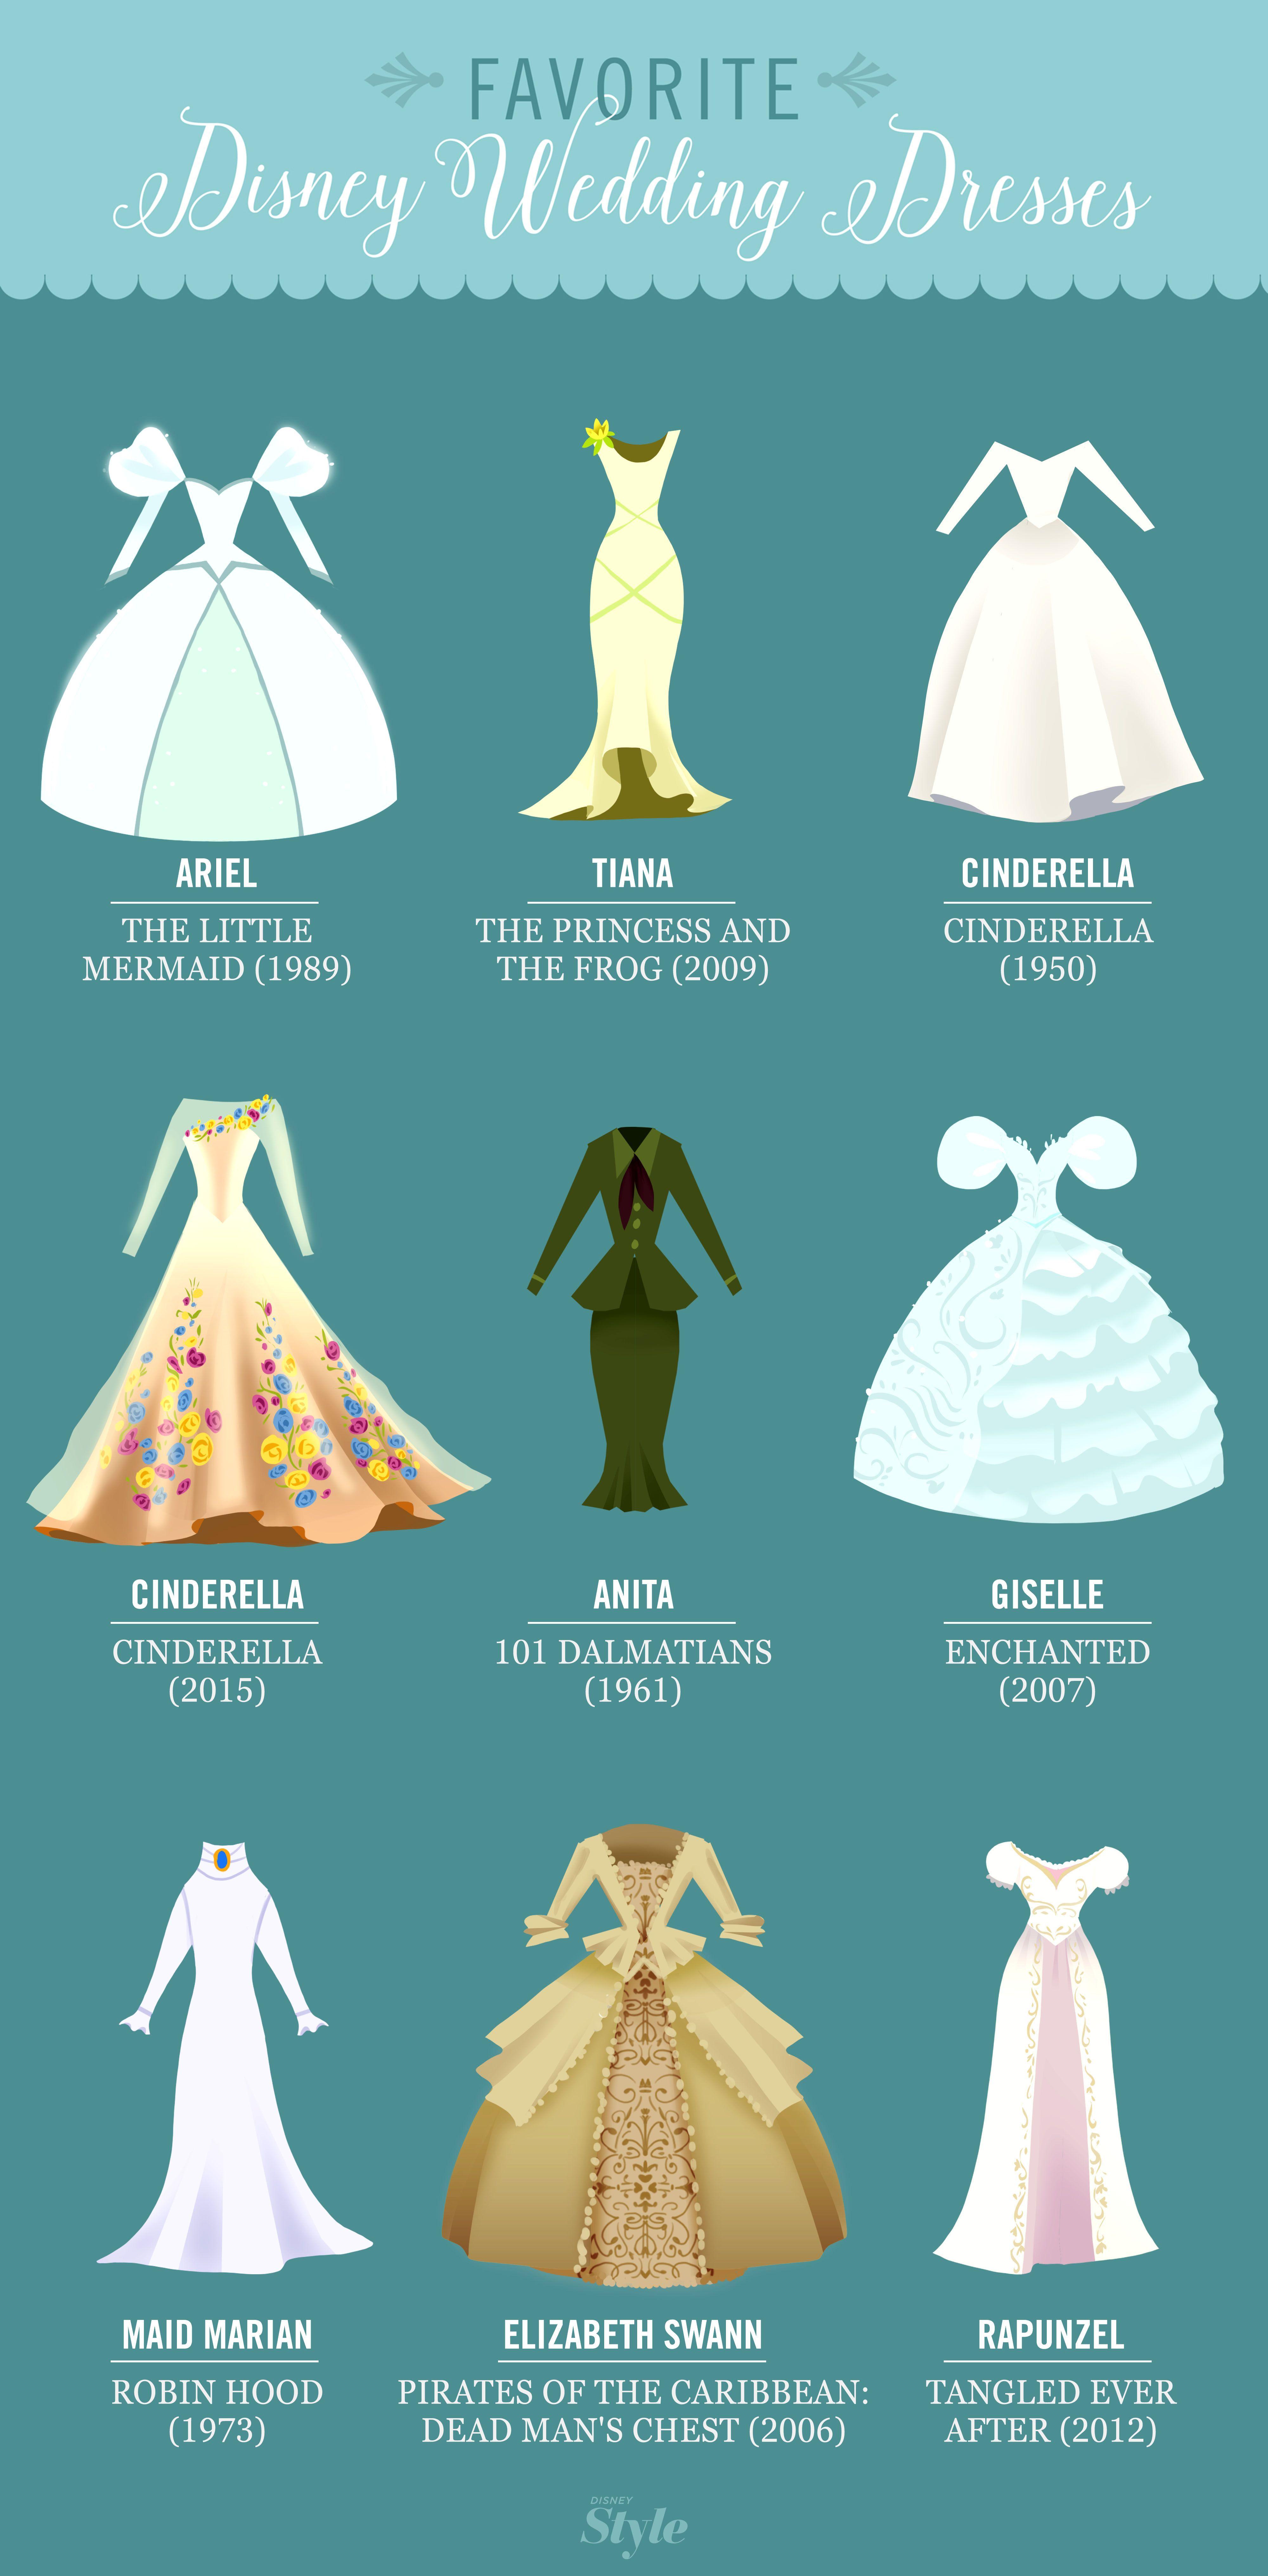 cinderella style wedding dress Which Disney wedding dress is your favorite